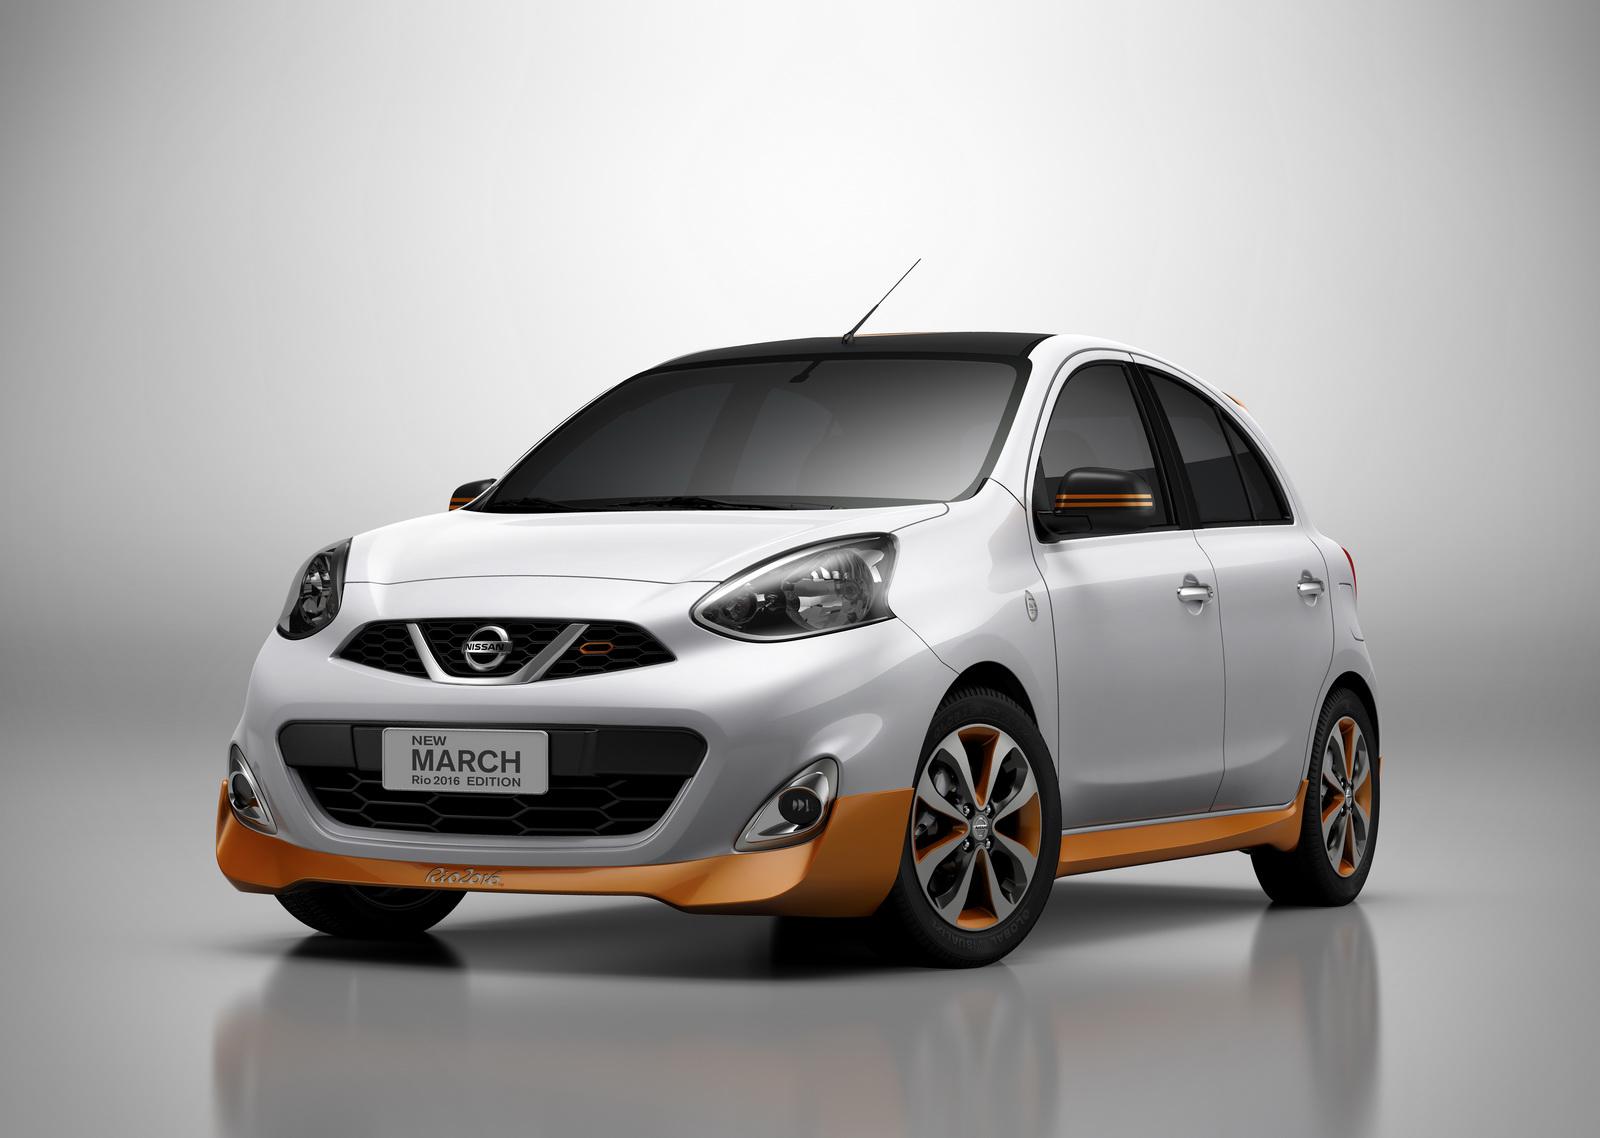 Nissan March Rio Olympics 2016 Edition